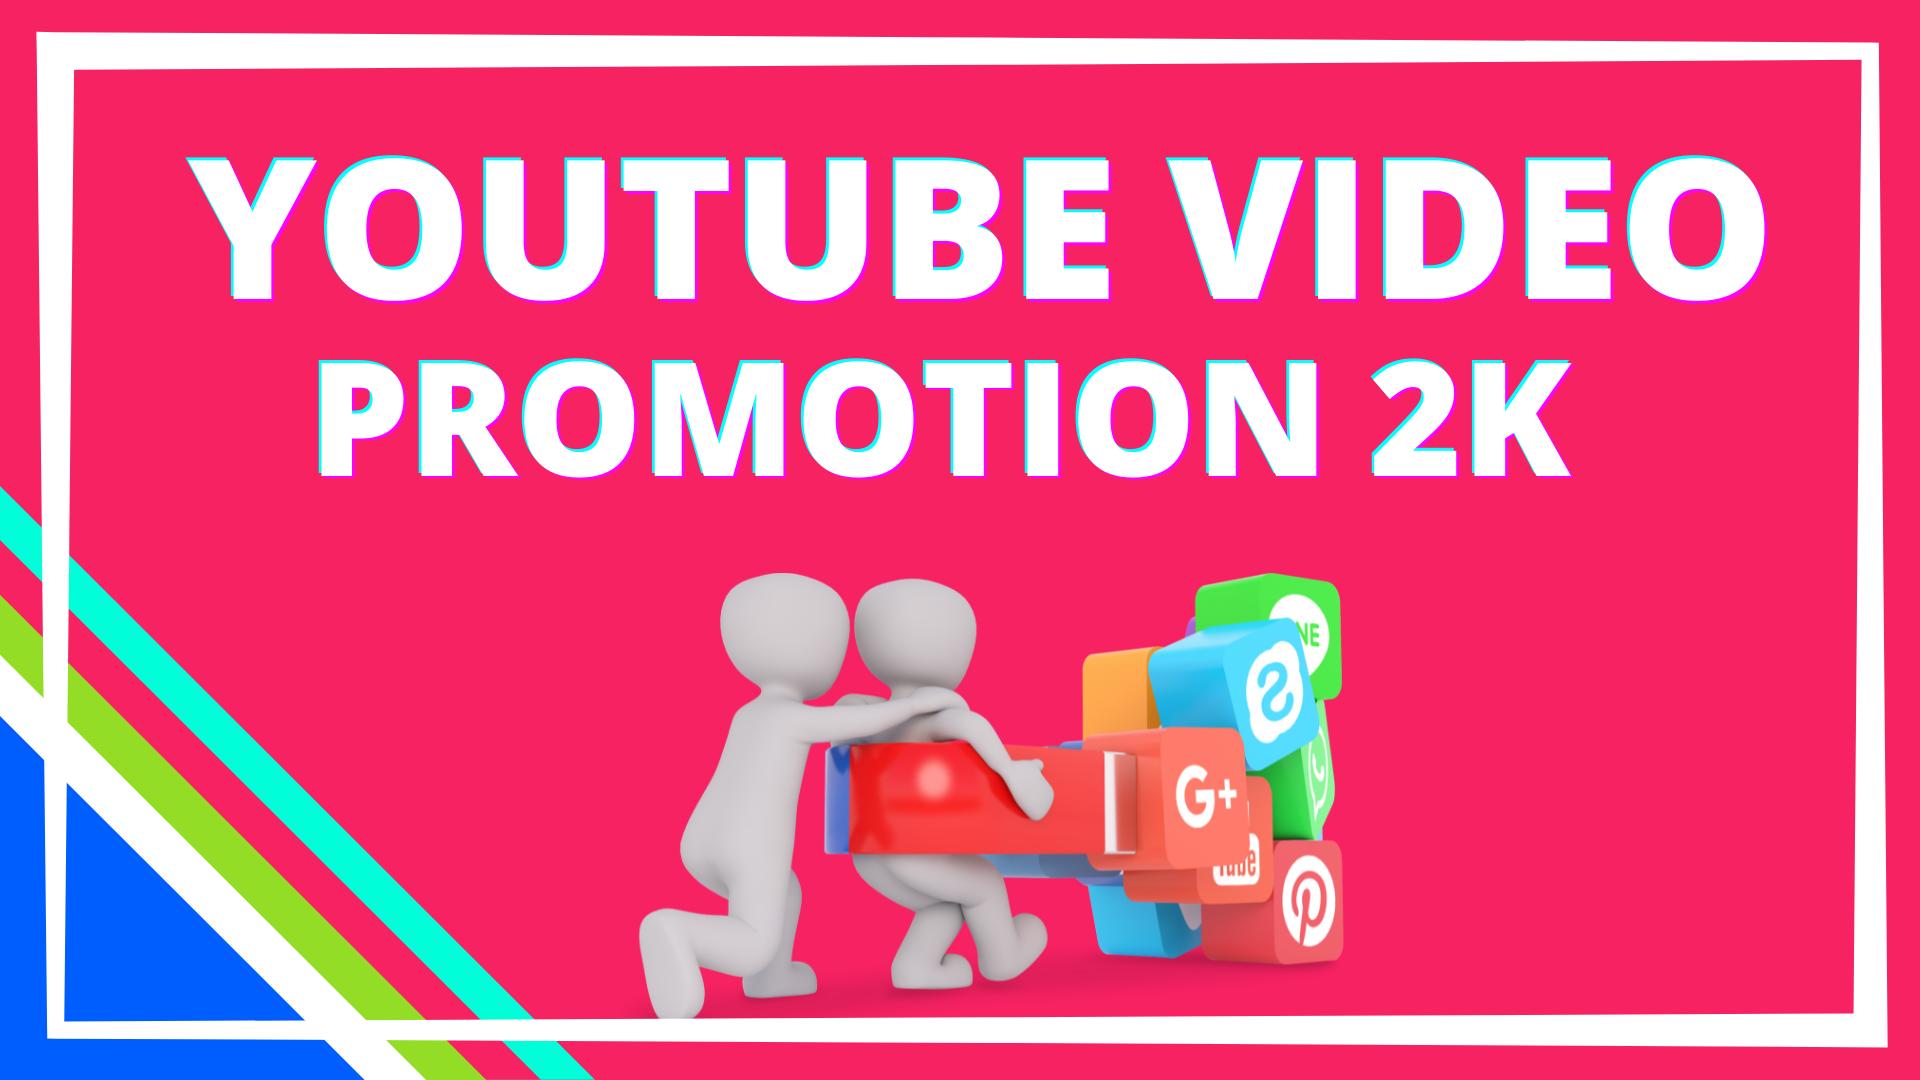 YouTube Video promotion Fully safe Social Media Marketing